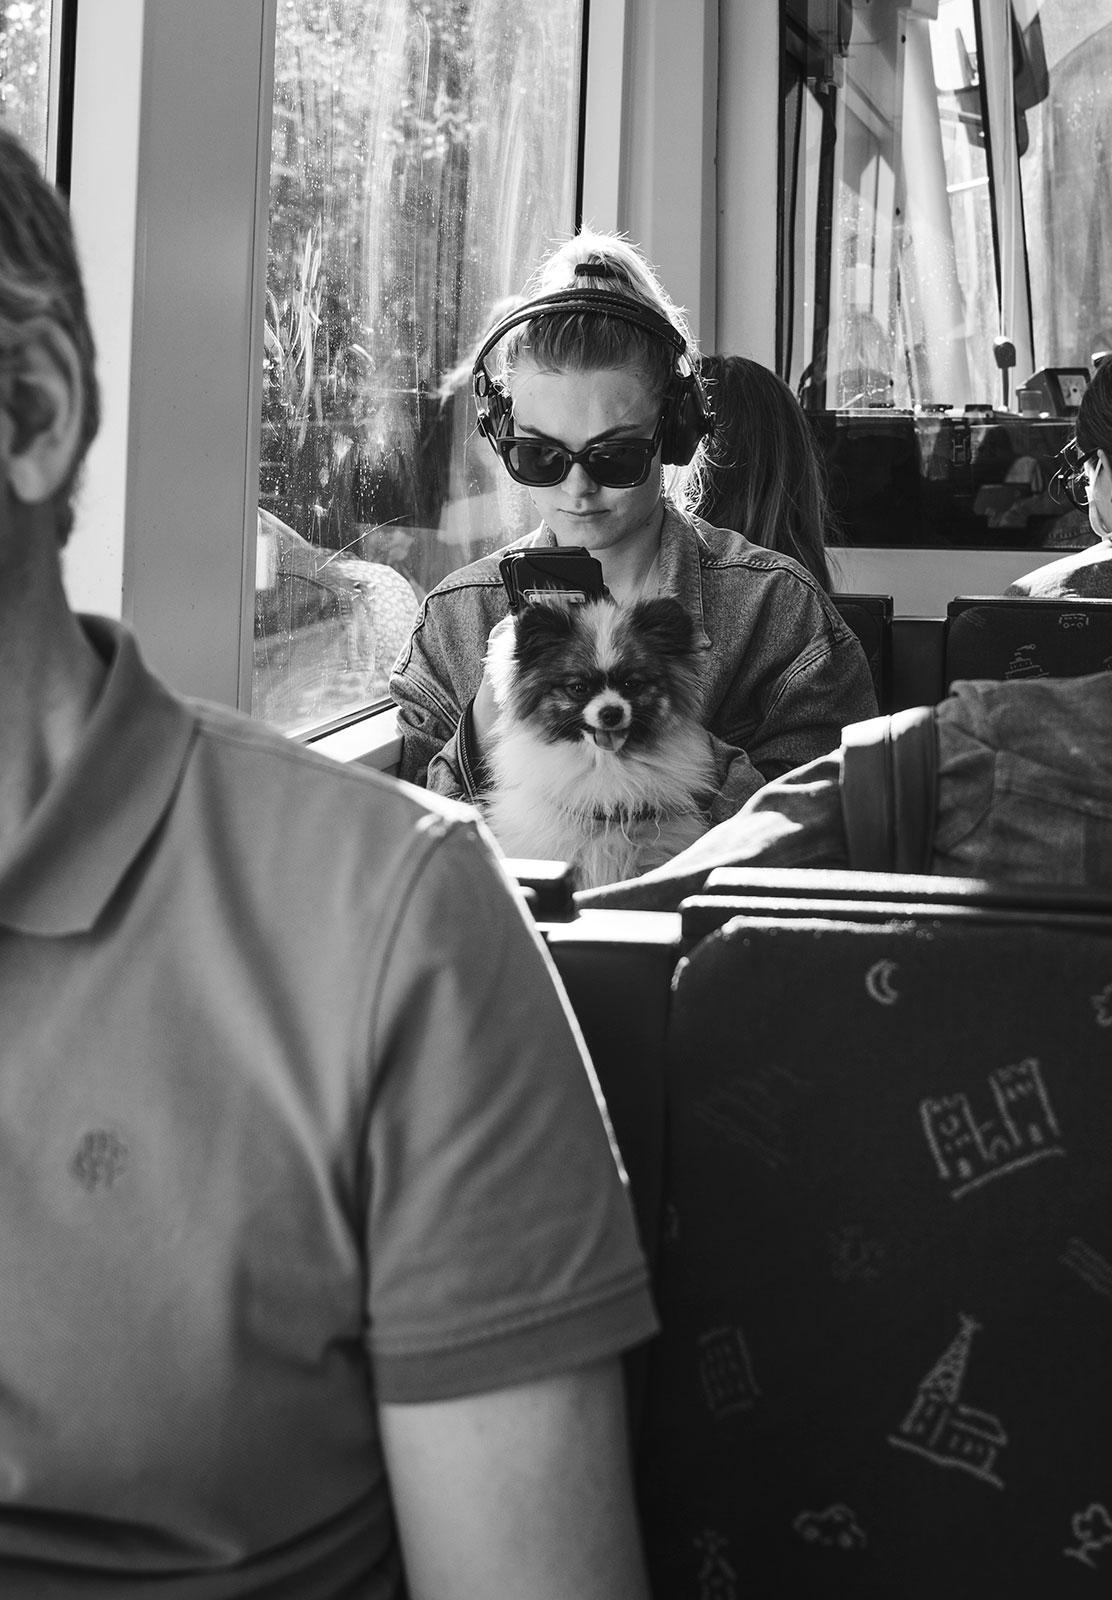 Dog sat on a train